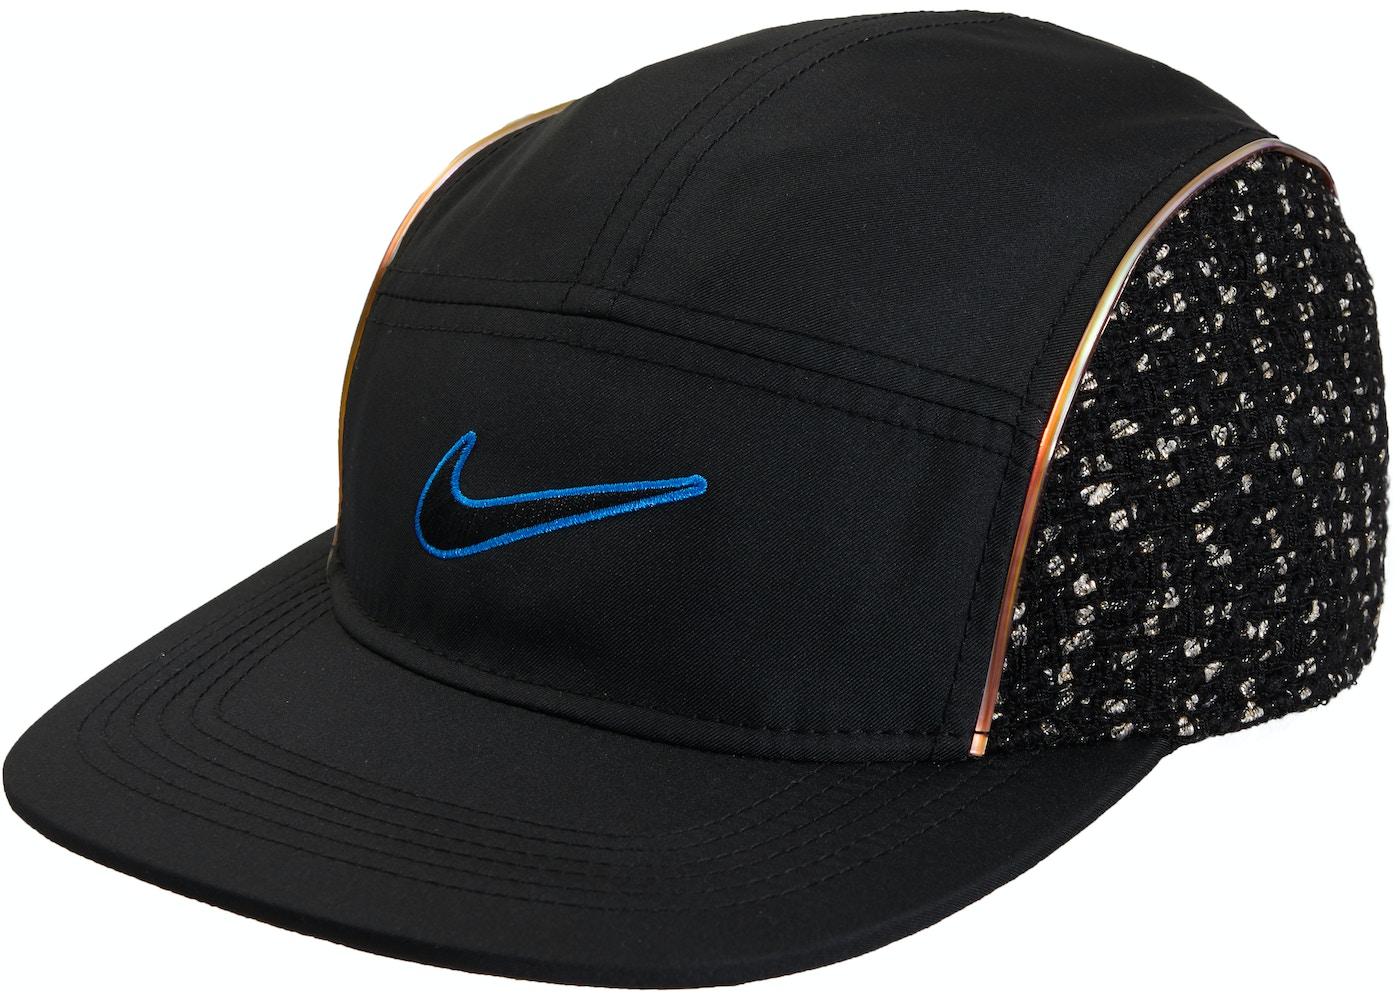 560f7ebcf49 Supreme Nike Boucle Running Hat Black. Nike Boucle Running